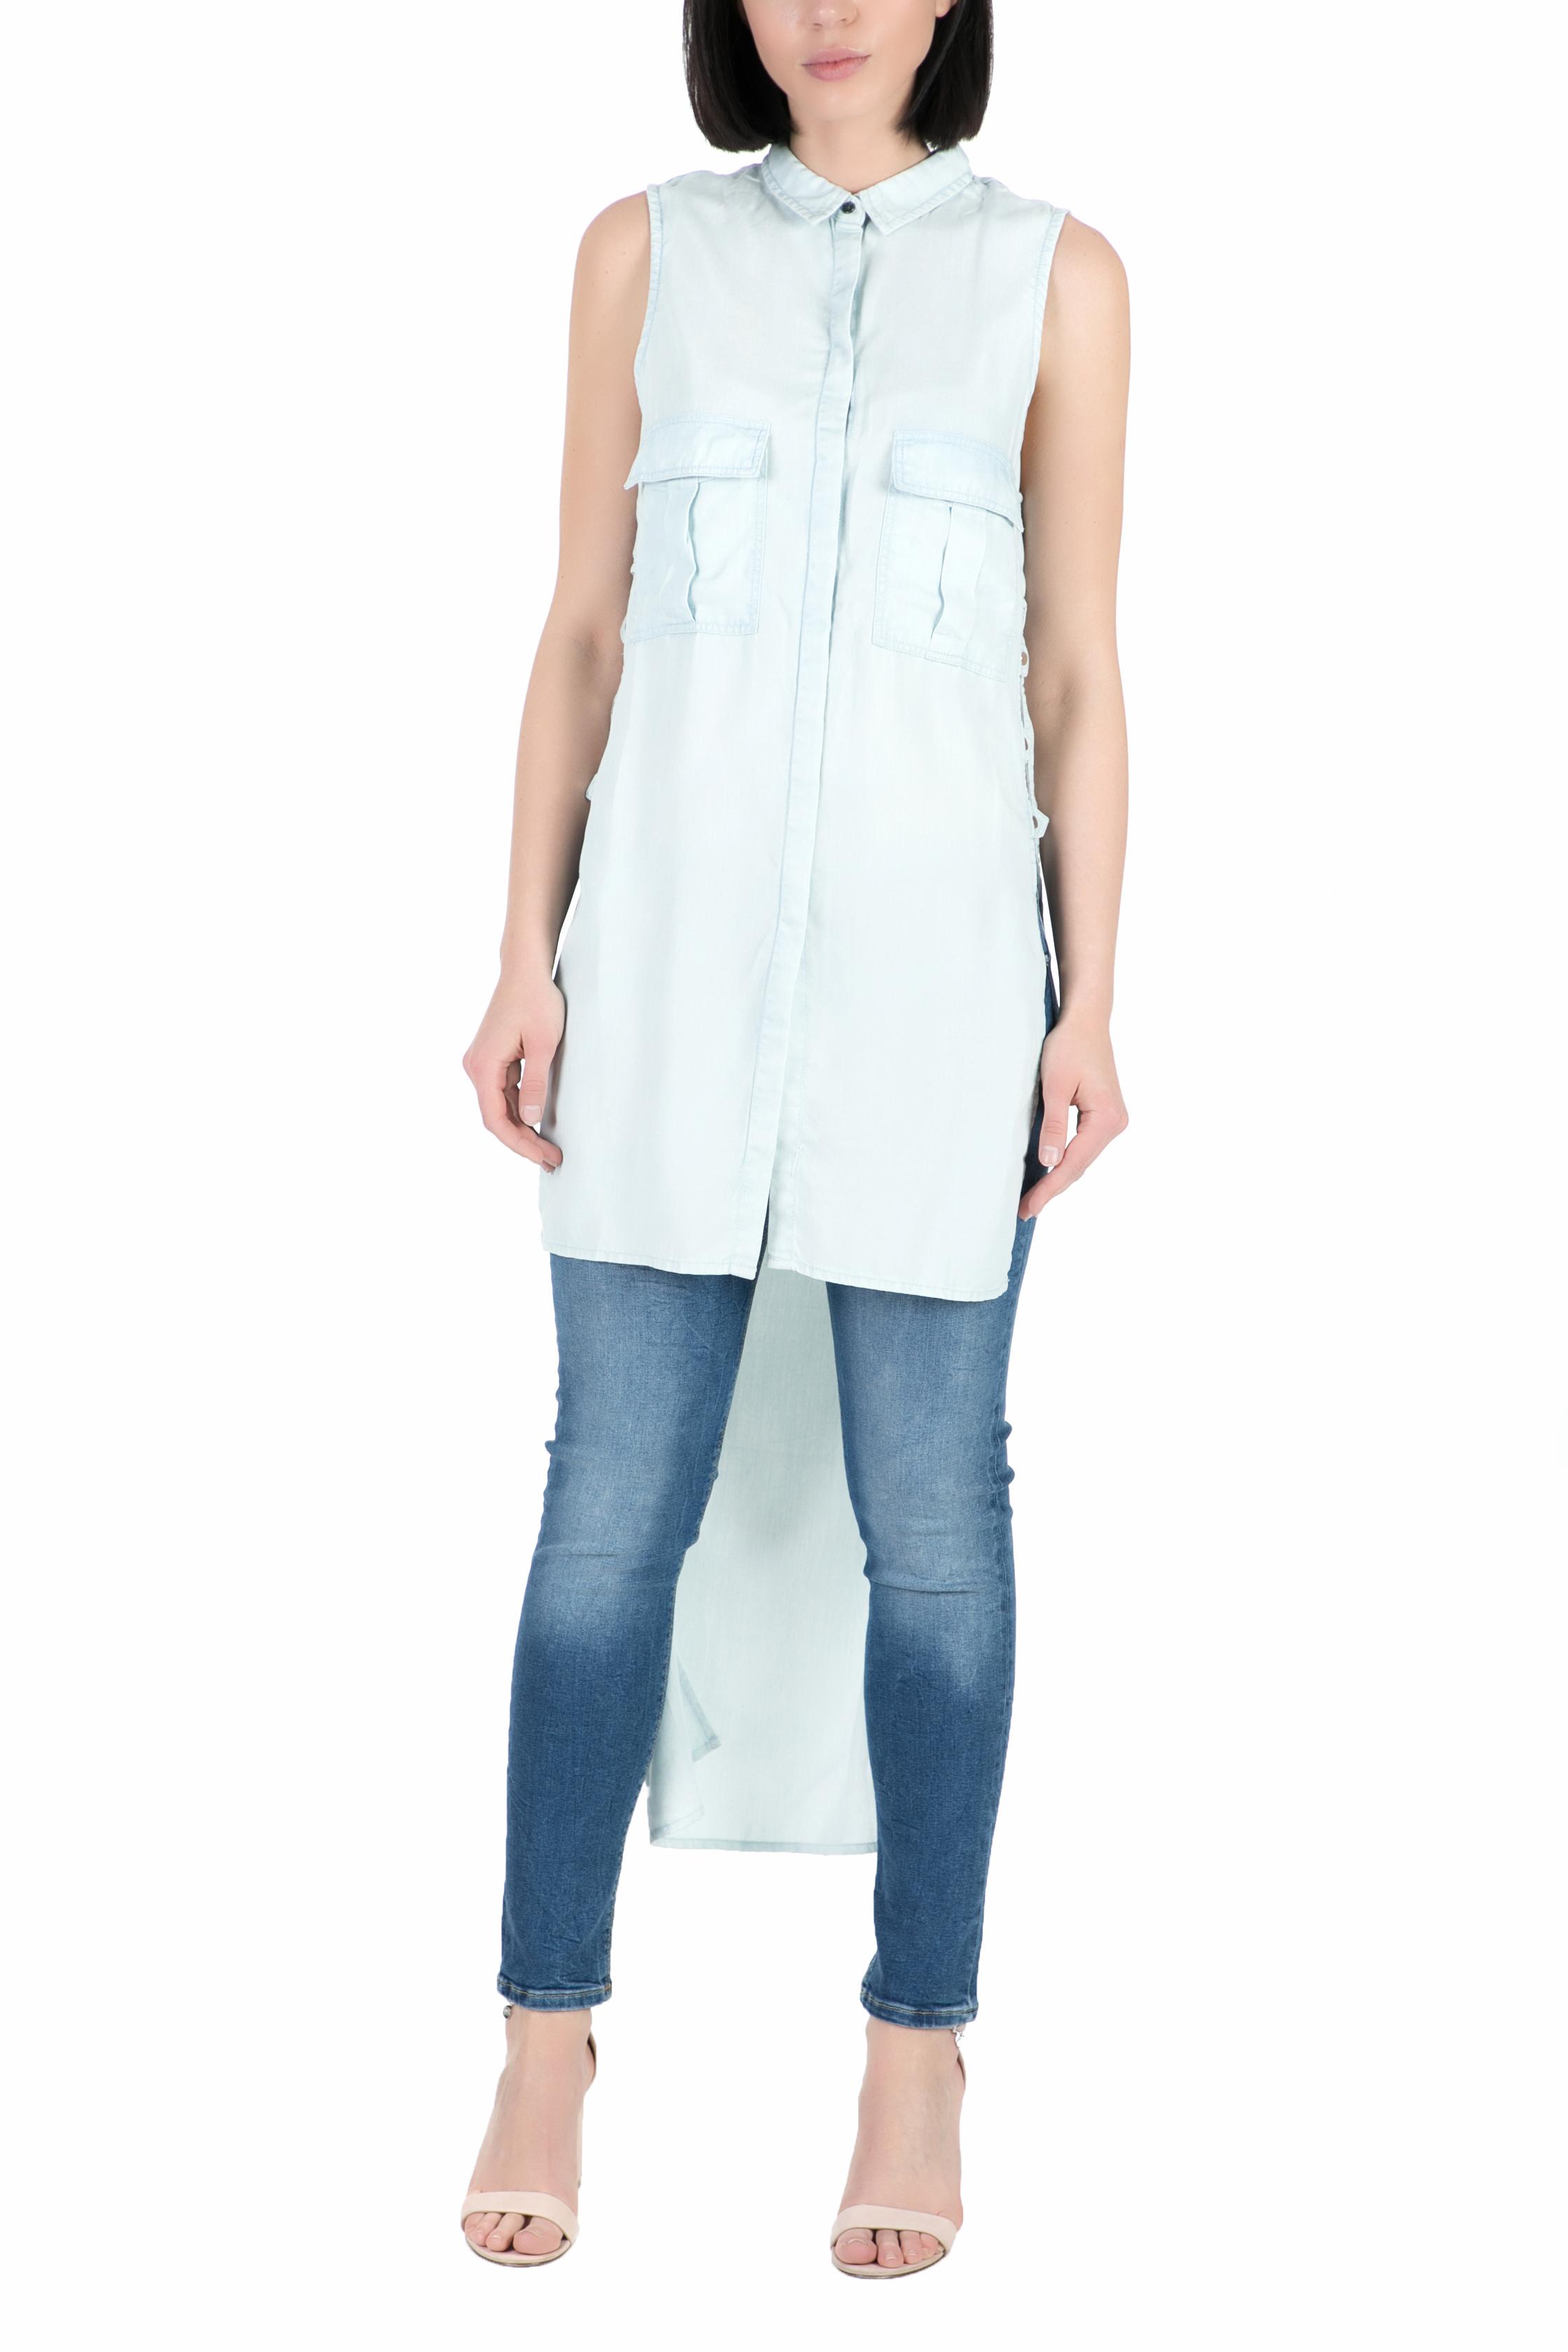 GUESS - Γυναικείο μακρυμάνικο πουκάμισο GUESS γαλάζιο